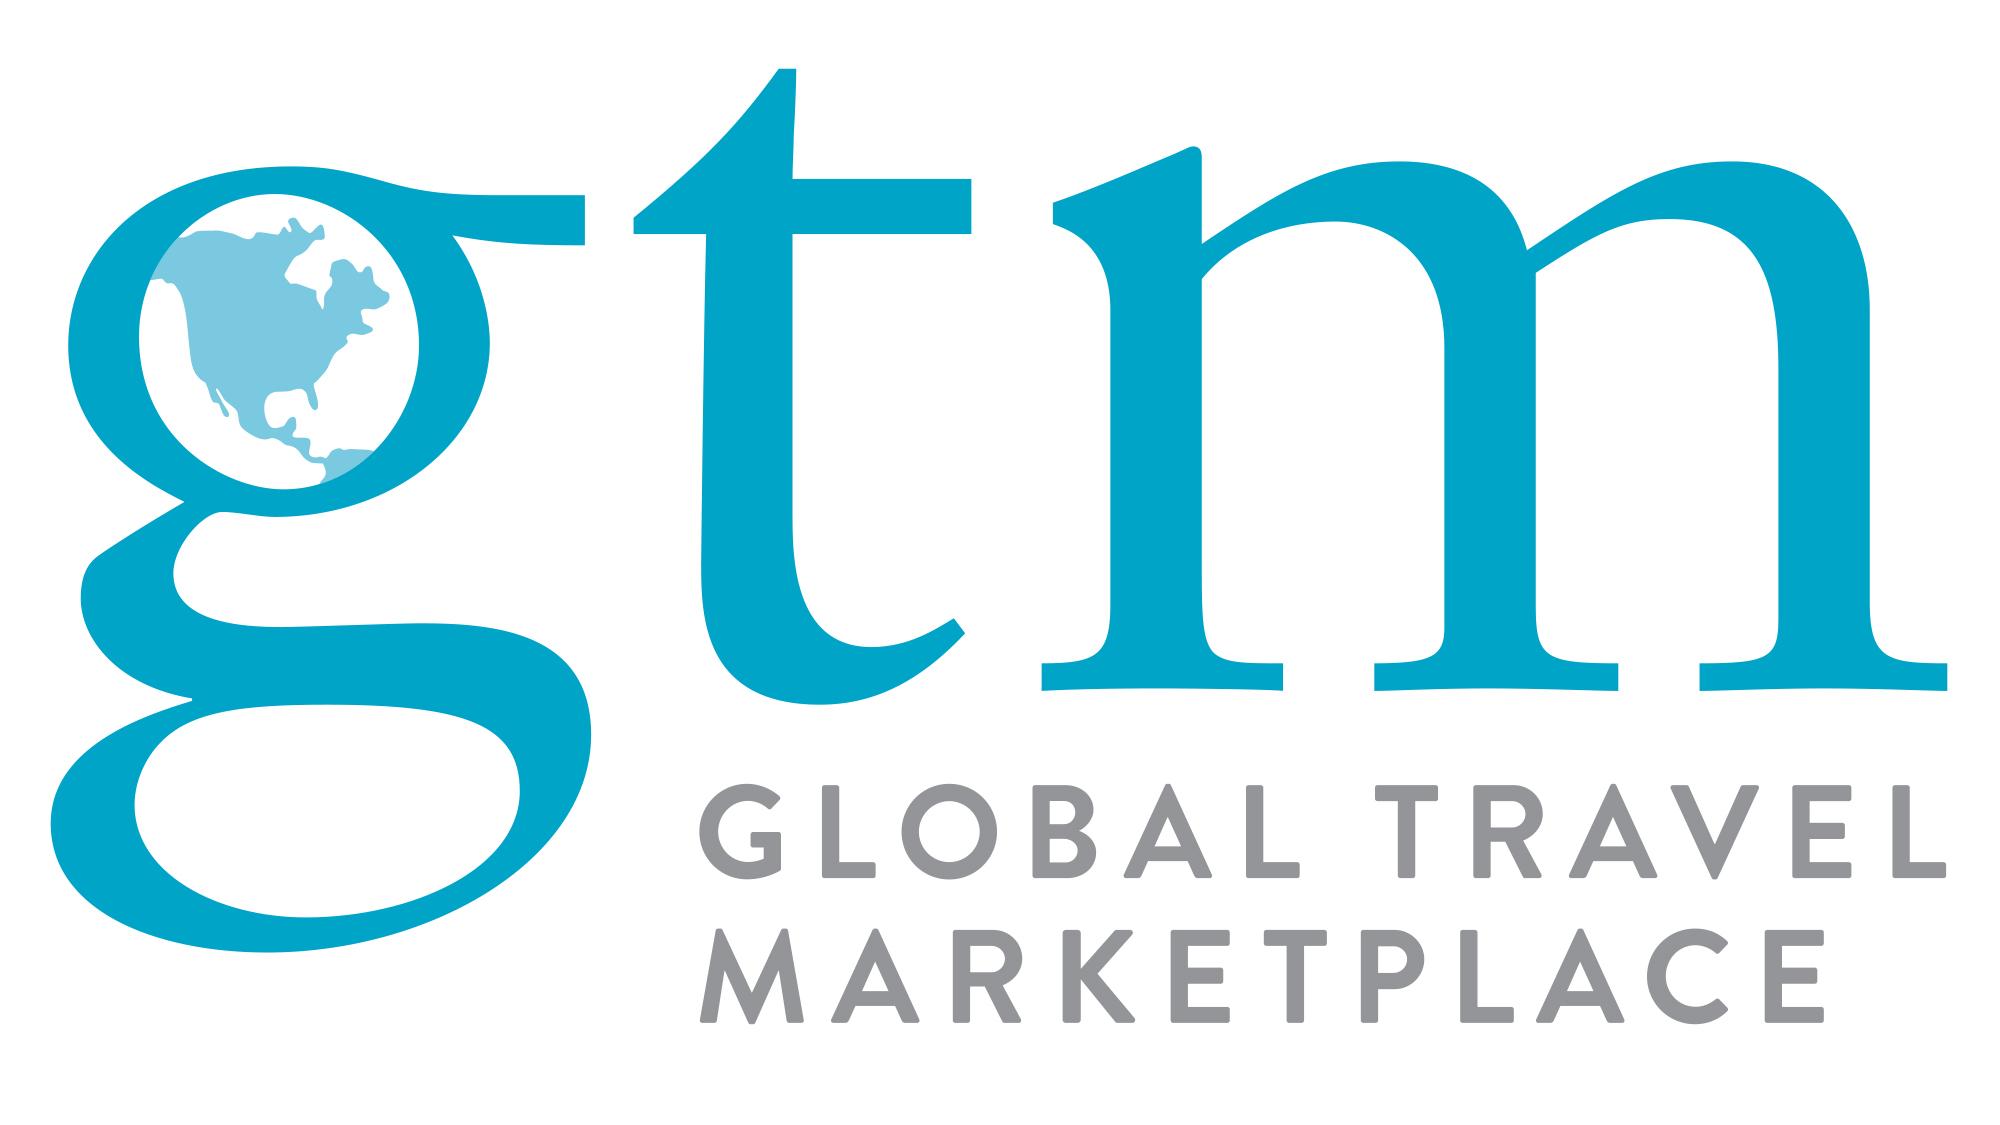 Global Travel Marketplace 2018 19 Advisory Board Announced Weekly